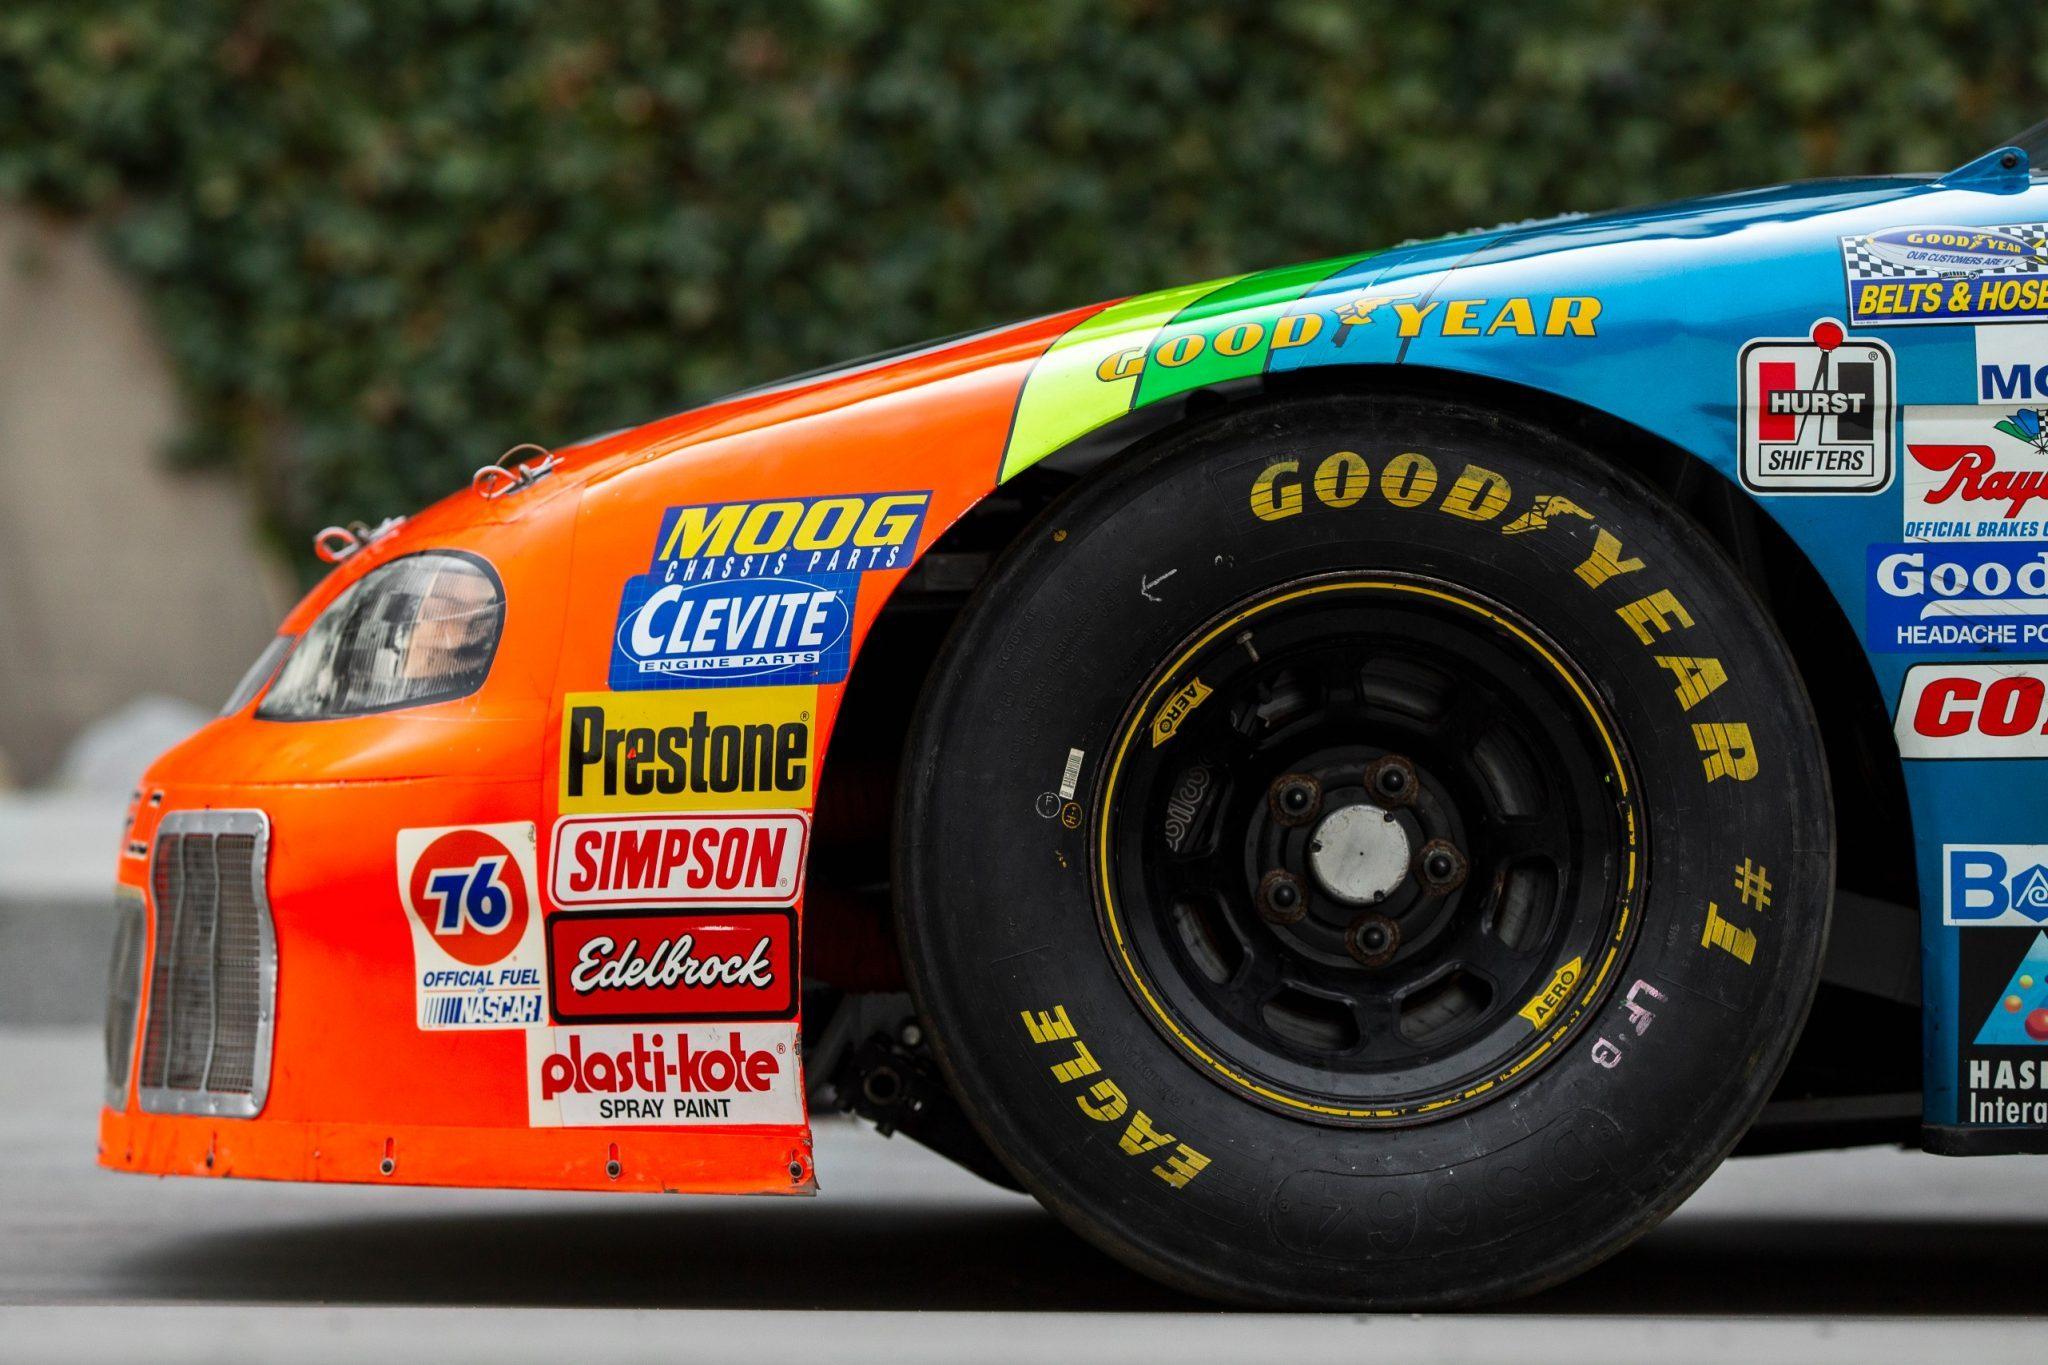 Jeff Gordon - Rainbow paint scheme - NASCAR Cup Series